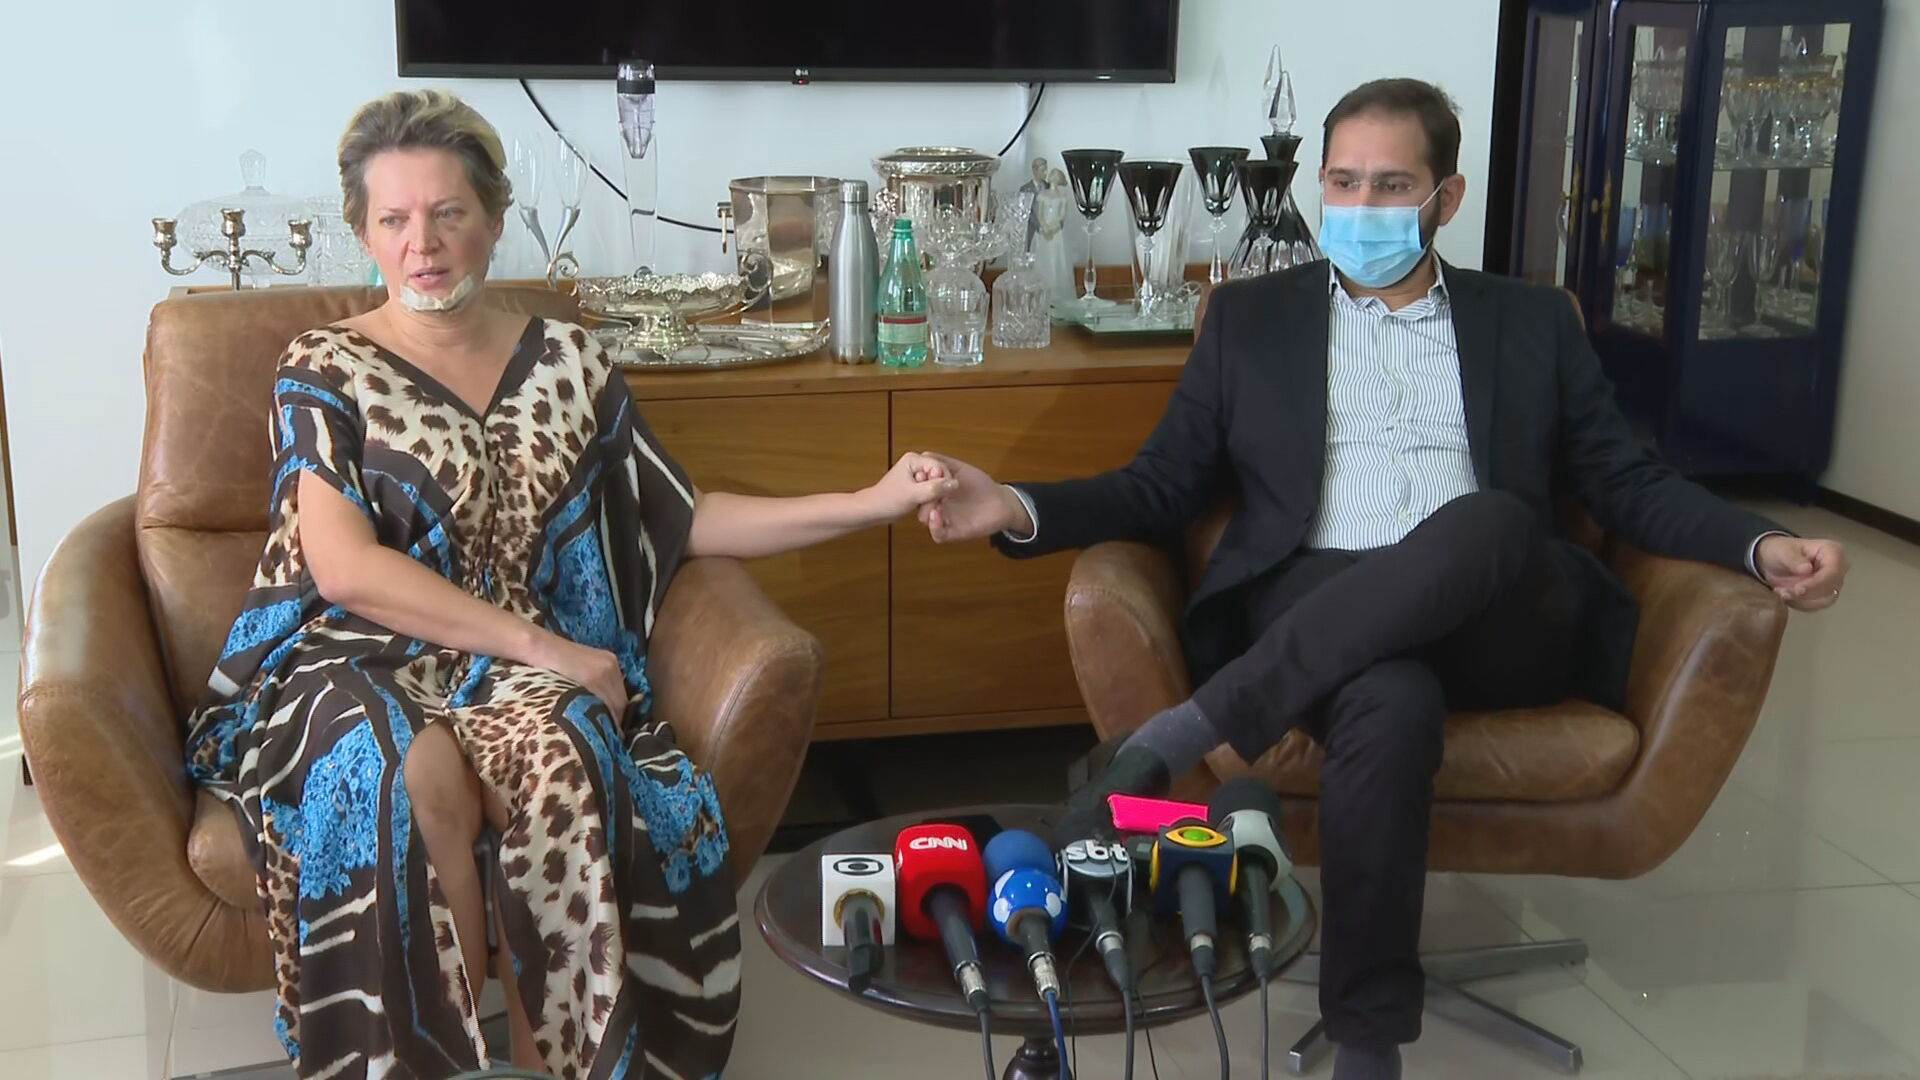 A deputada federal Joice Hasselmann (PSL-SP) e o marido Daniel França (25.Jul.21